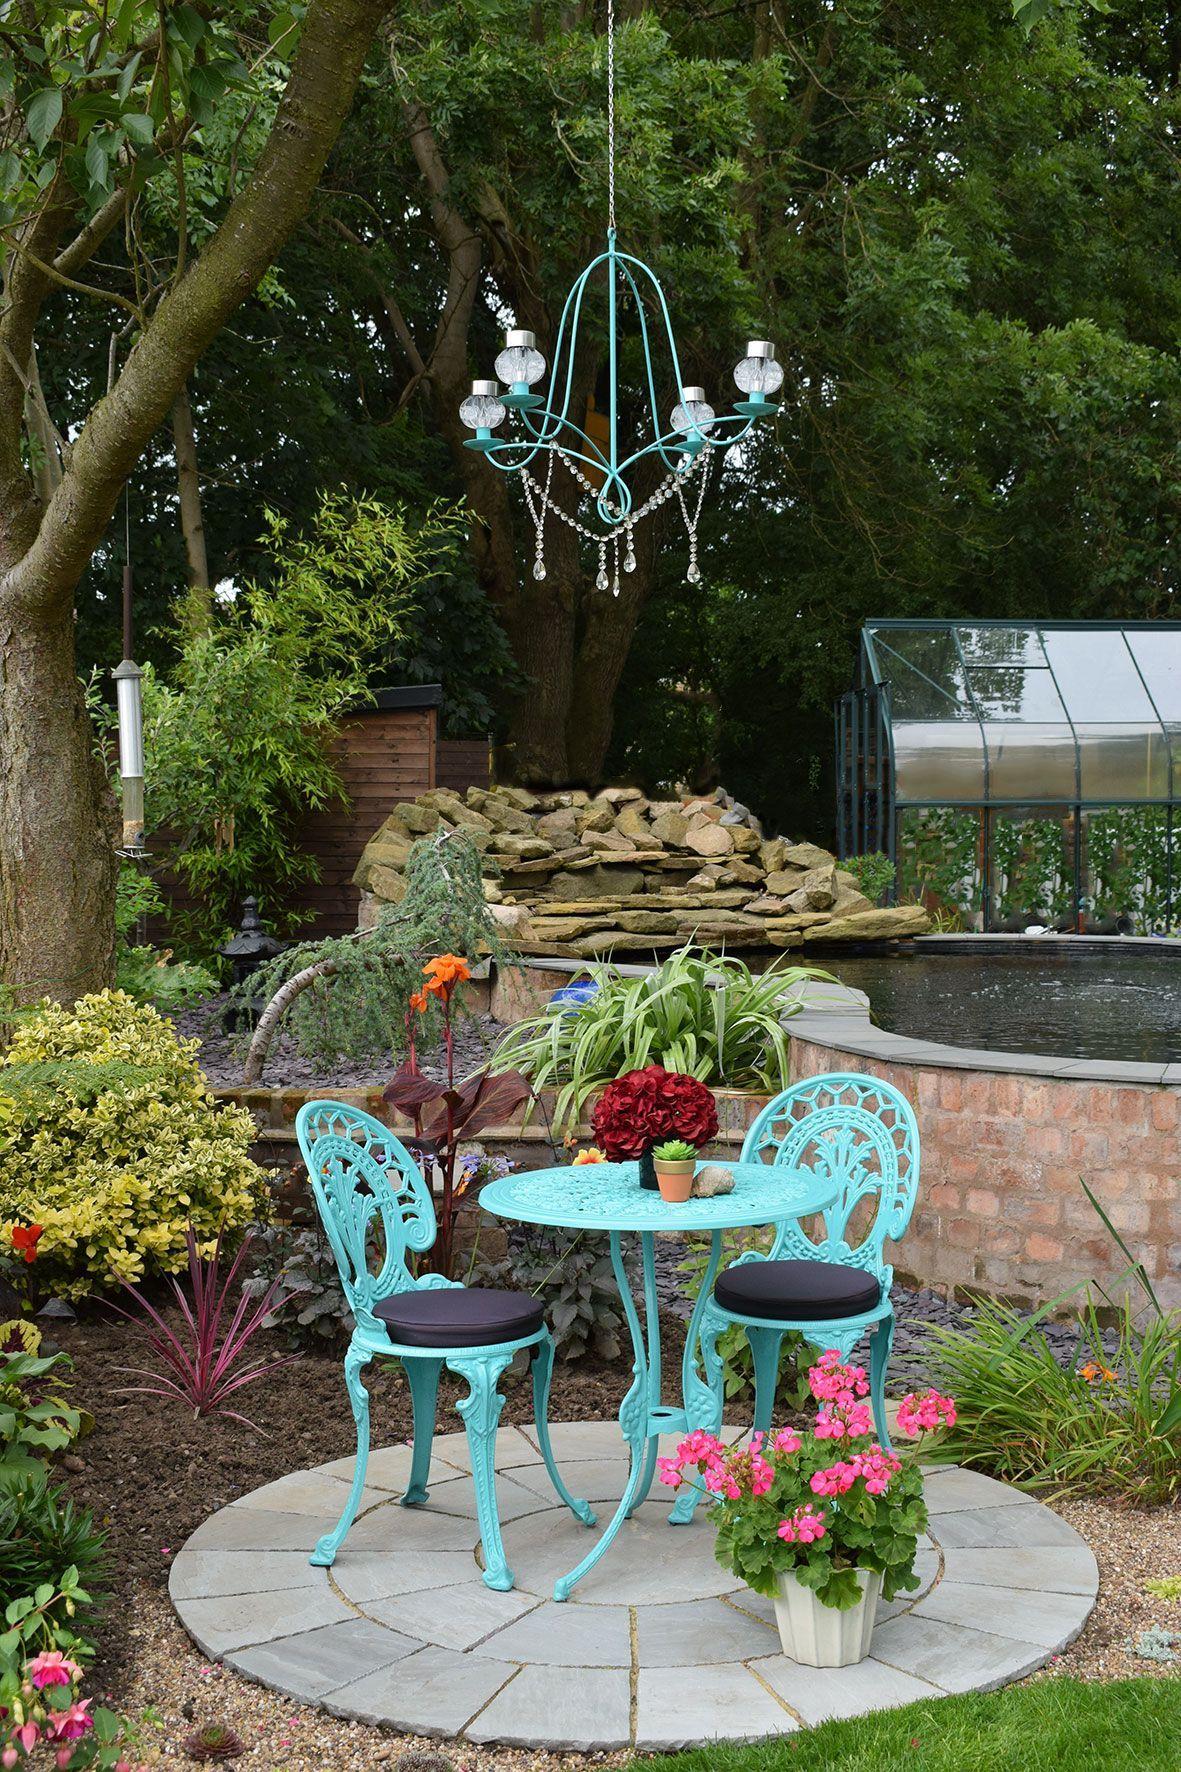 DIY Solar Chandelier to Glam up your Garden Diy solar